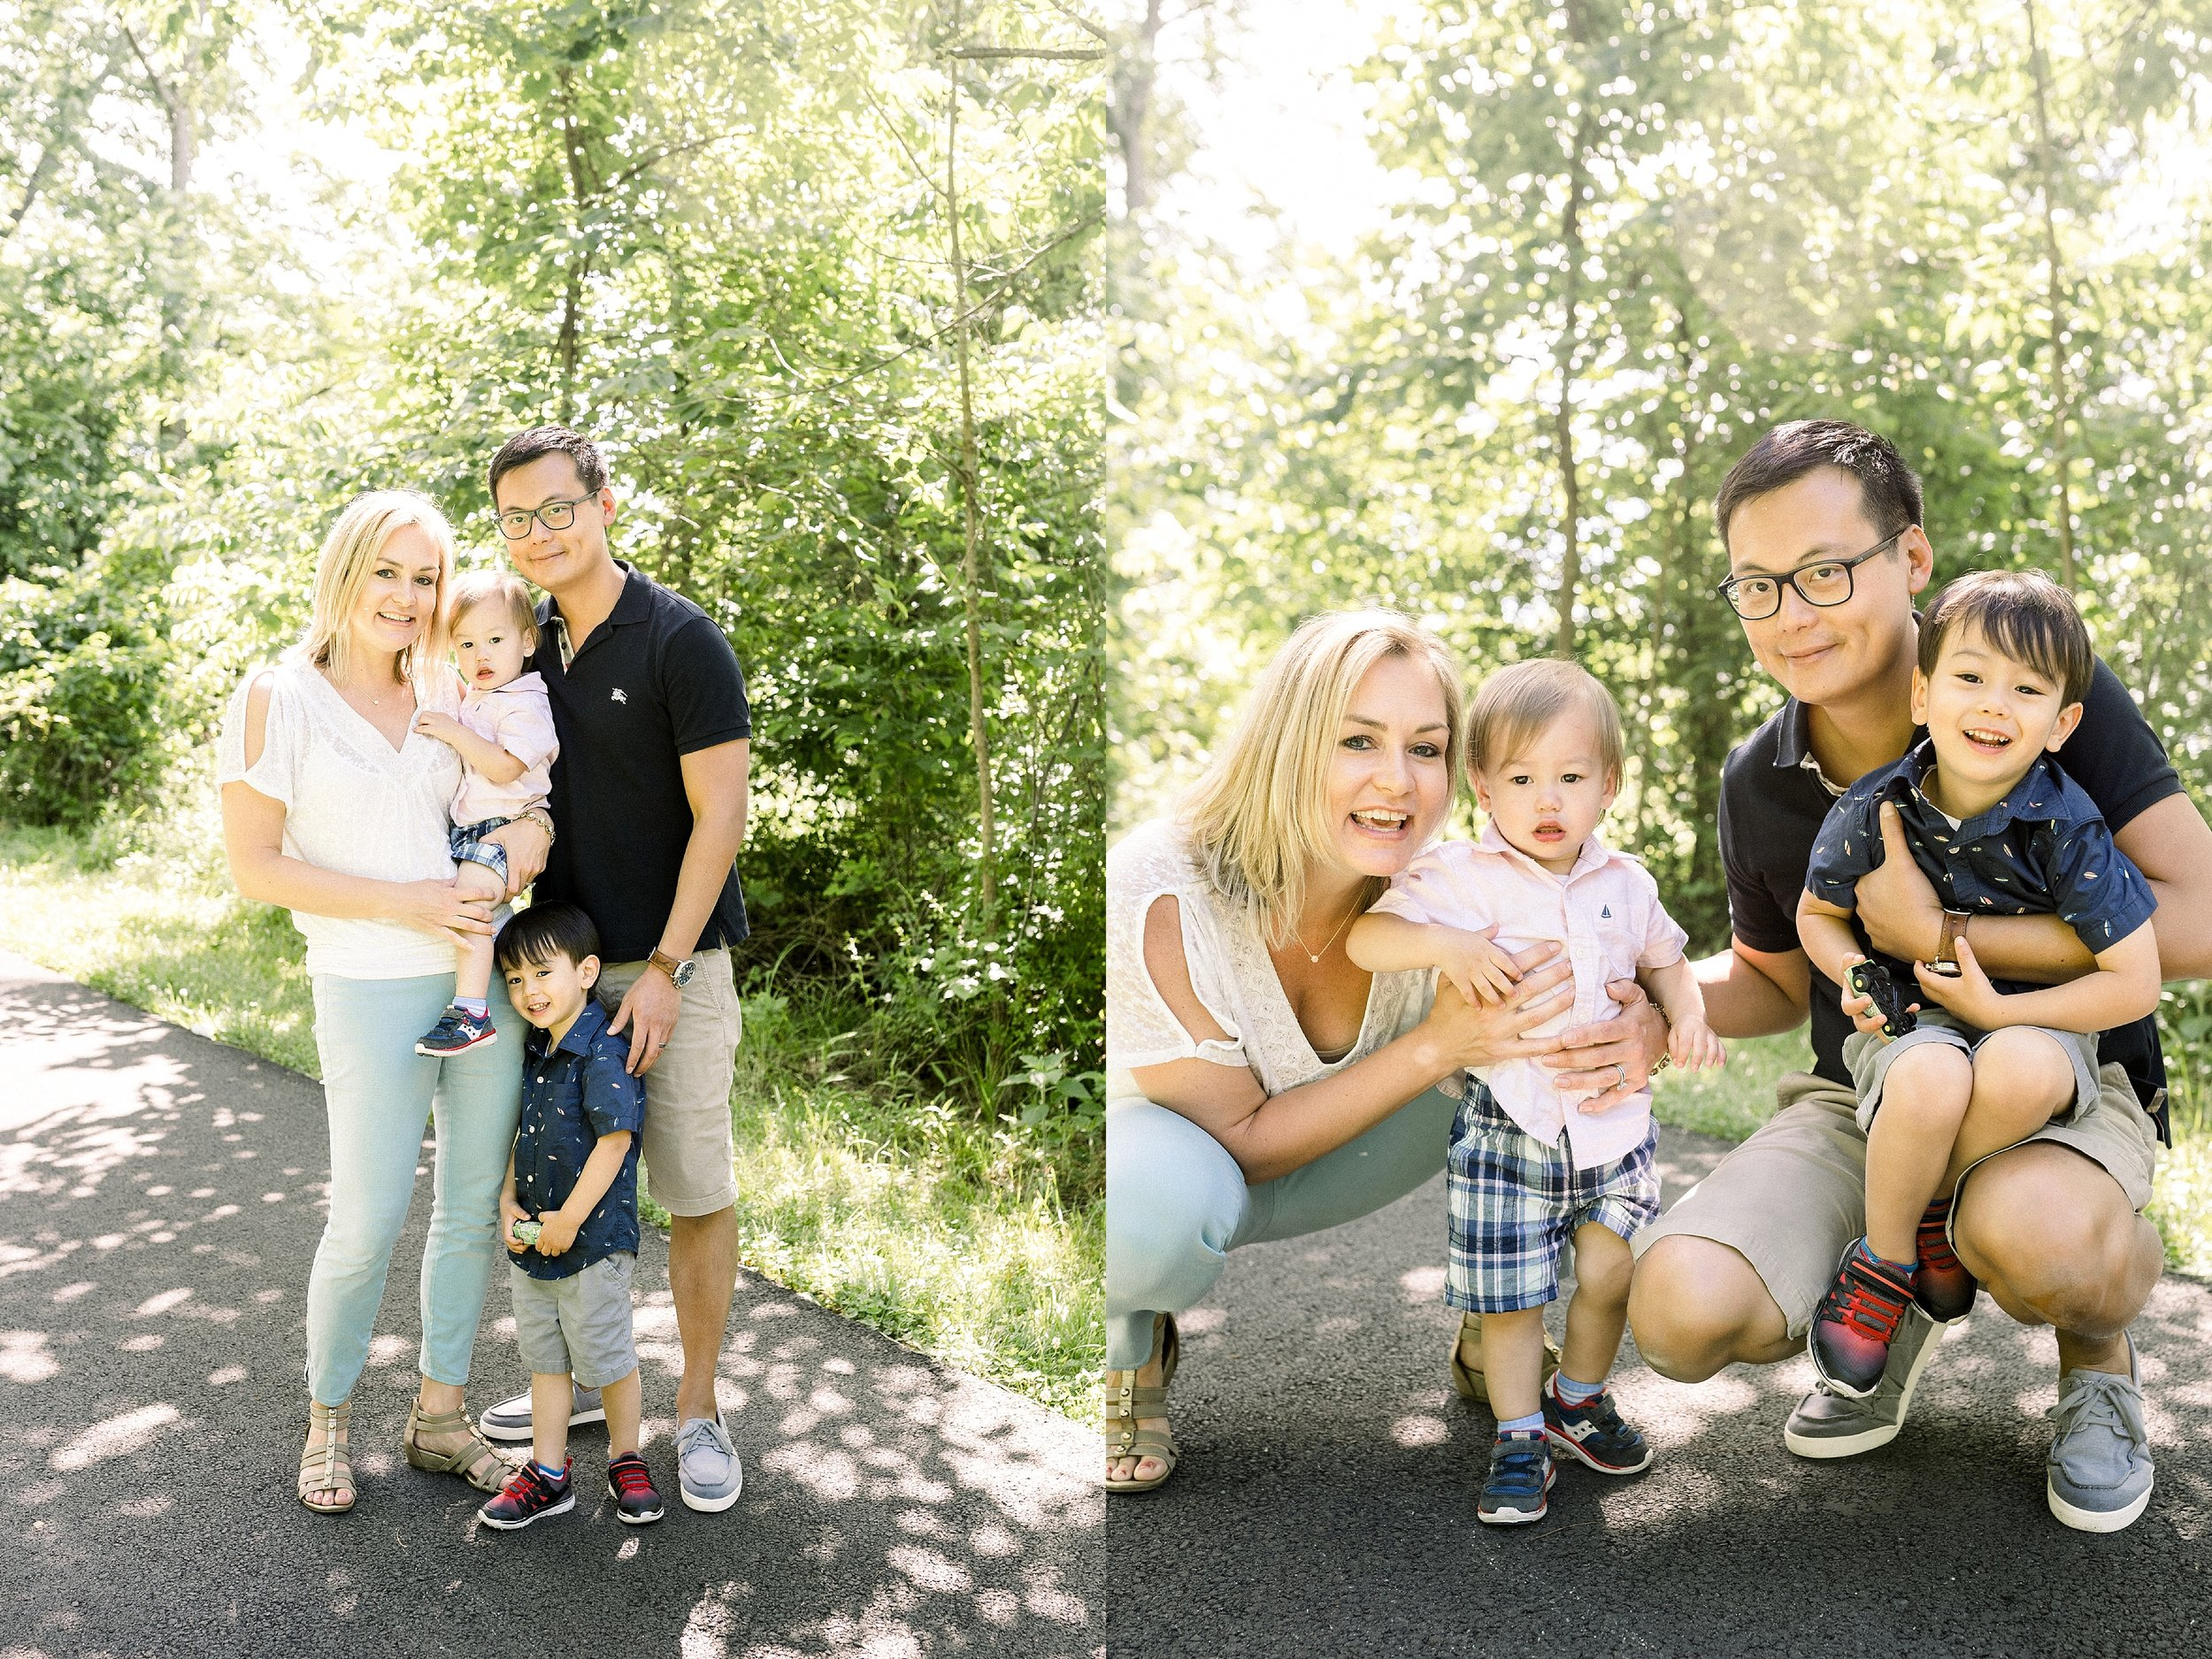 Bucks-County-Family-Photographer_0008-1.jpg